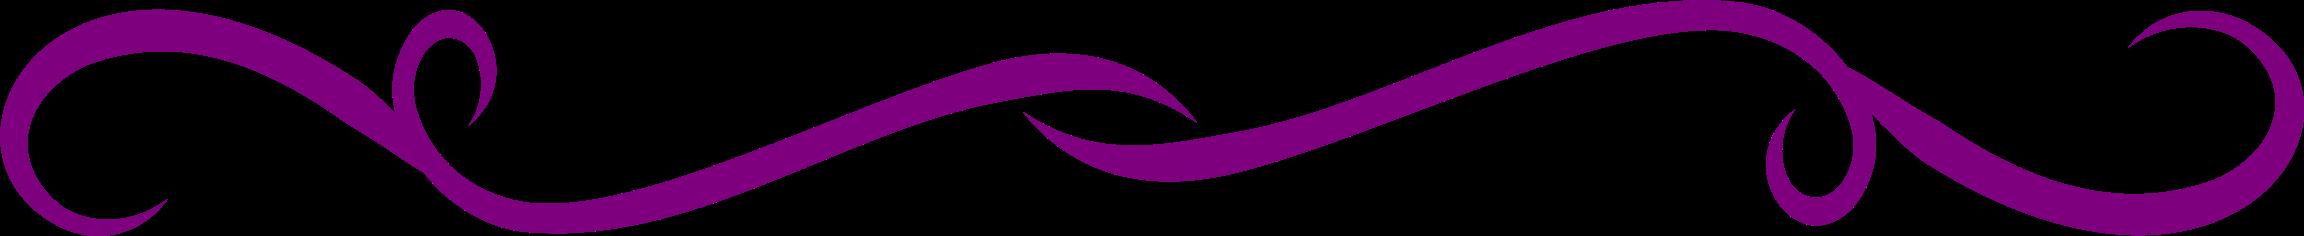 banner transparent library Line clipart purple. Free on dumielauxepices net.